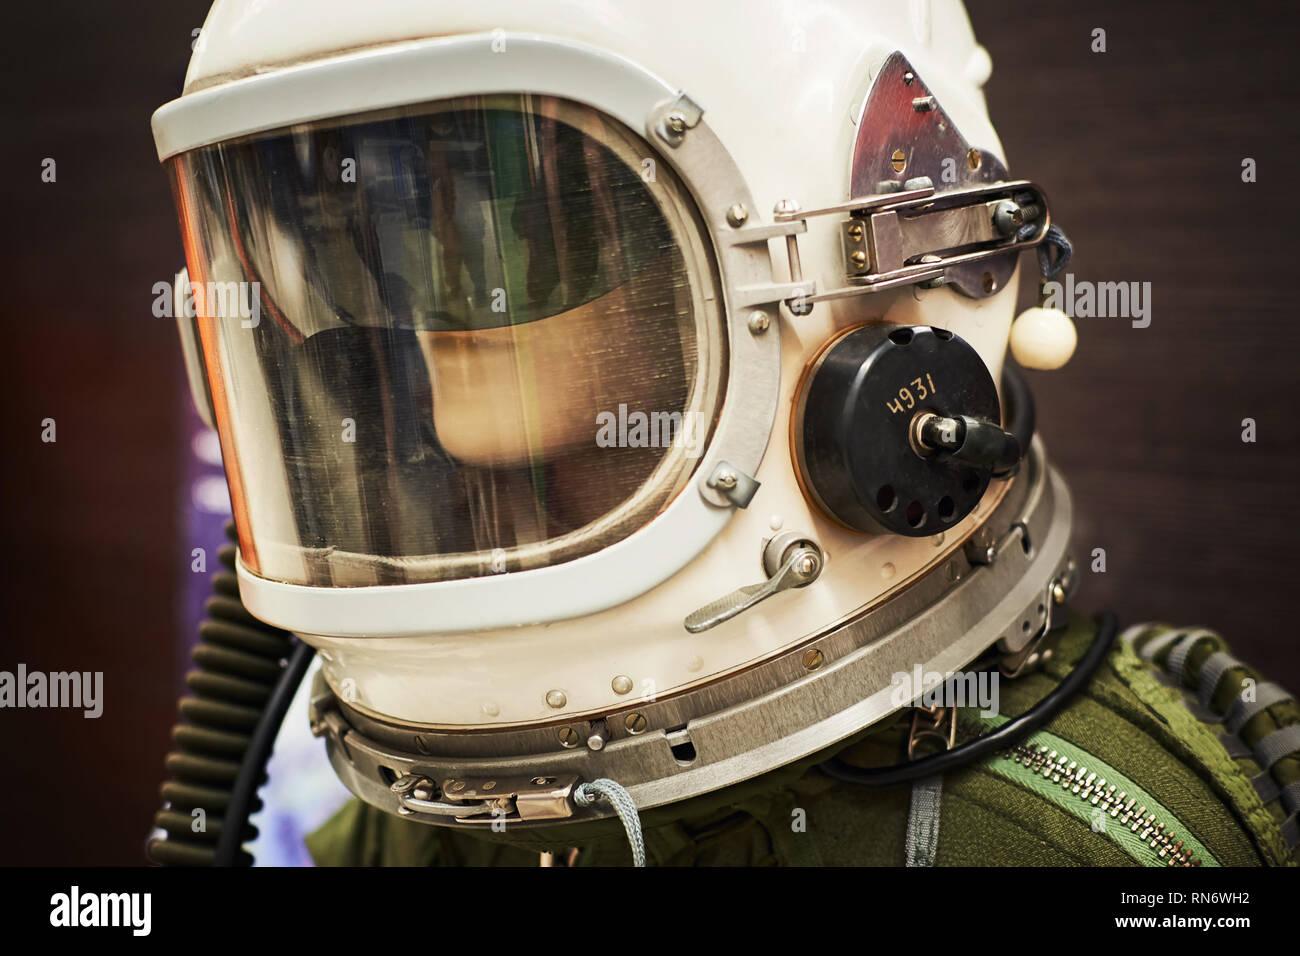 Astronaut Costume Retro Vintage Stock Photos & Astronaut ...